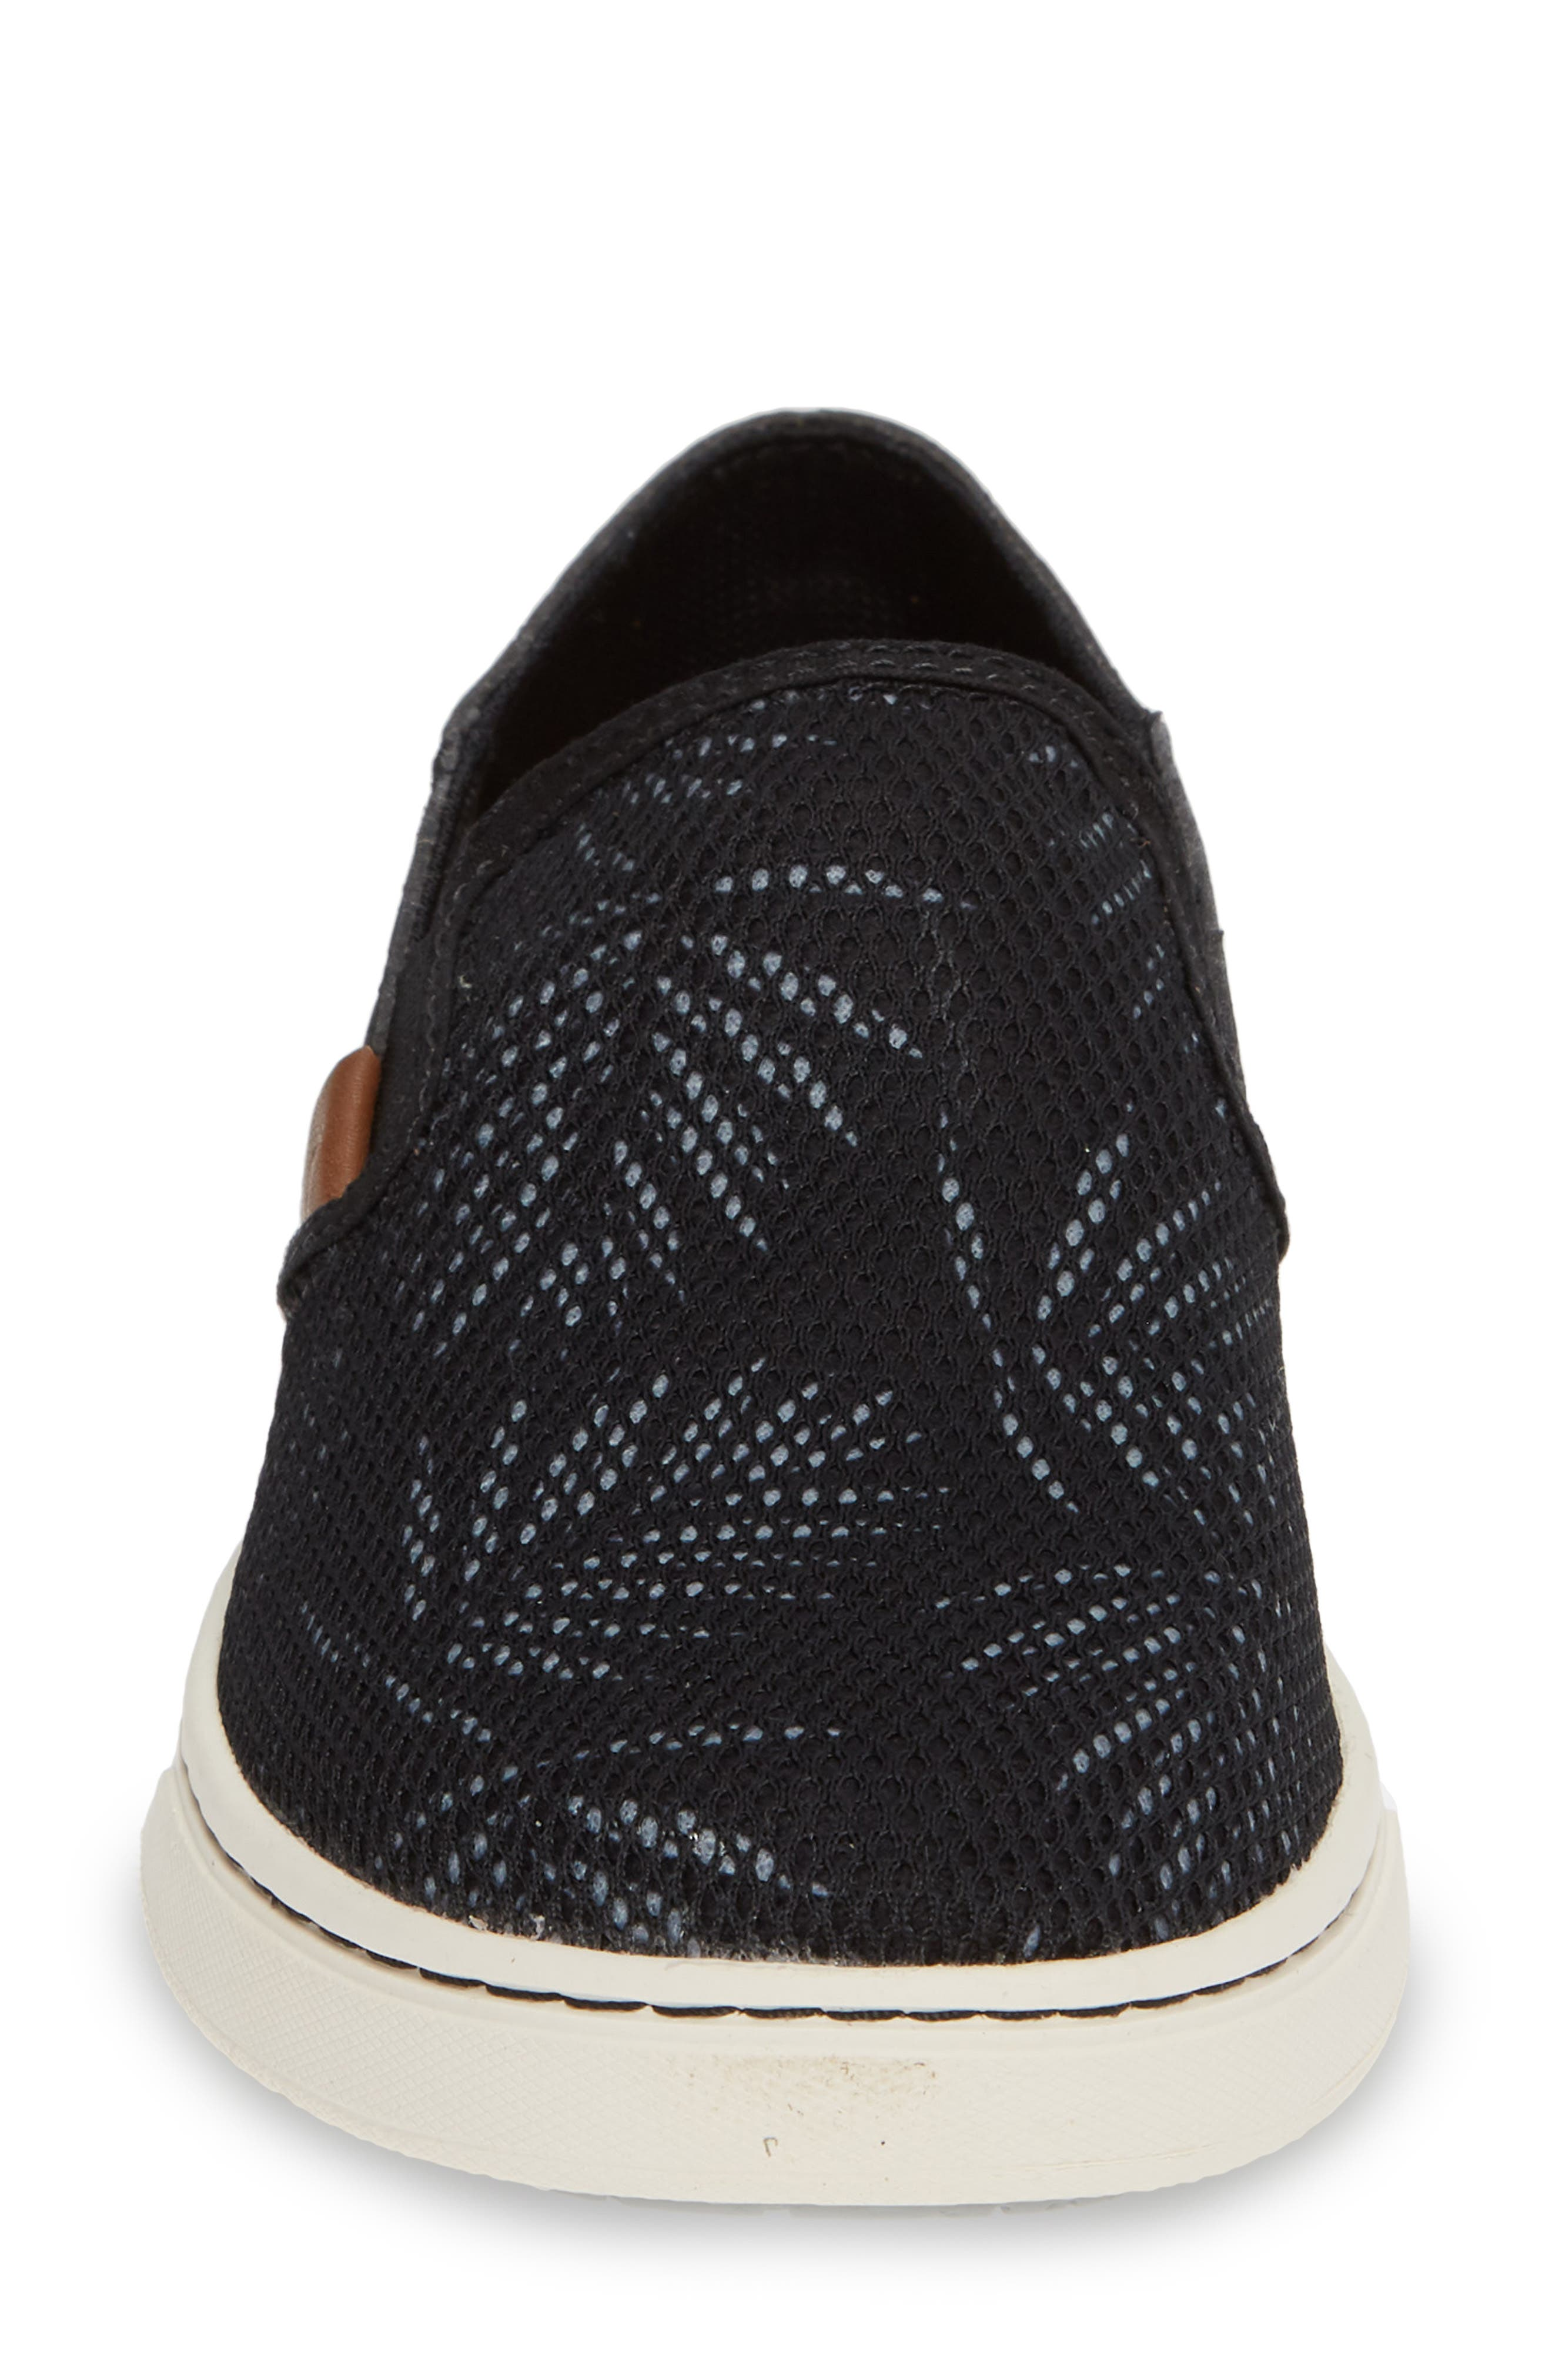 OLUKAI, 'Pehuea' Slip-On Sneaker, Alternate thumbnail 4, color, BLACK/ PALM FABRIC